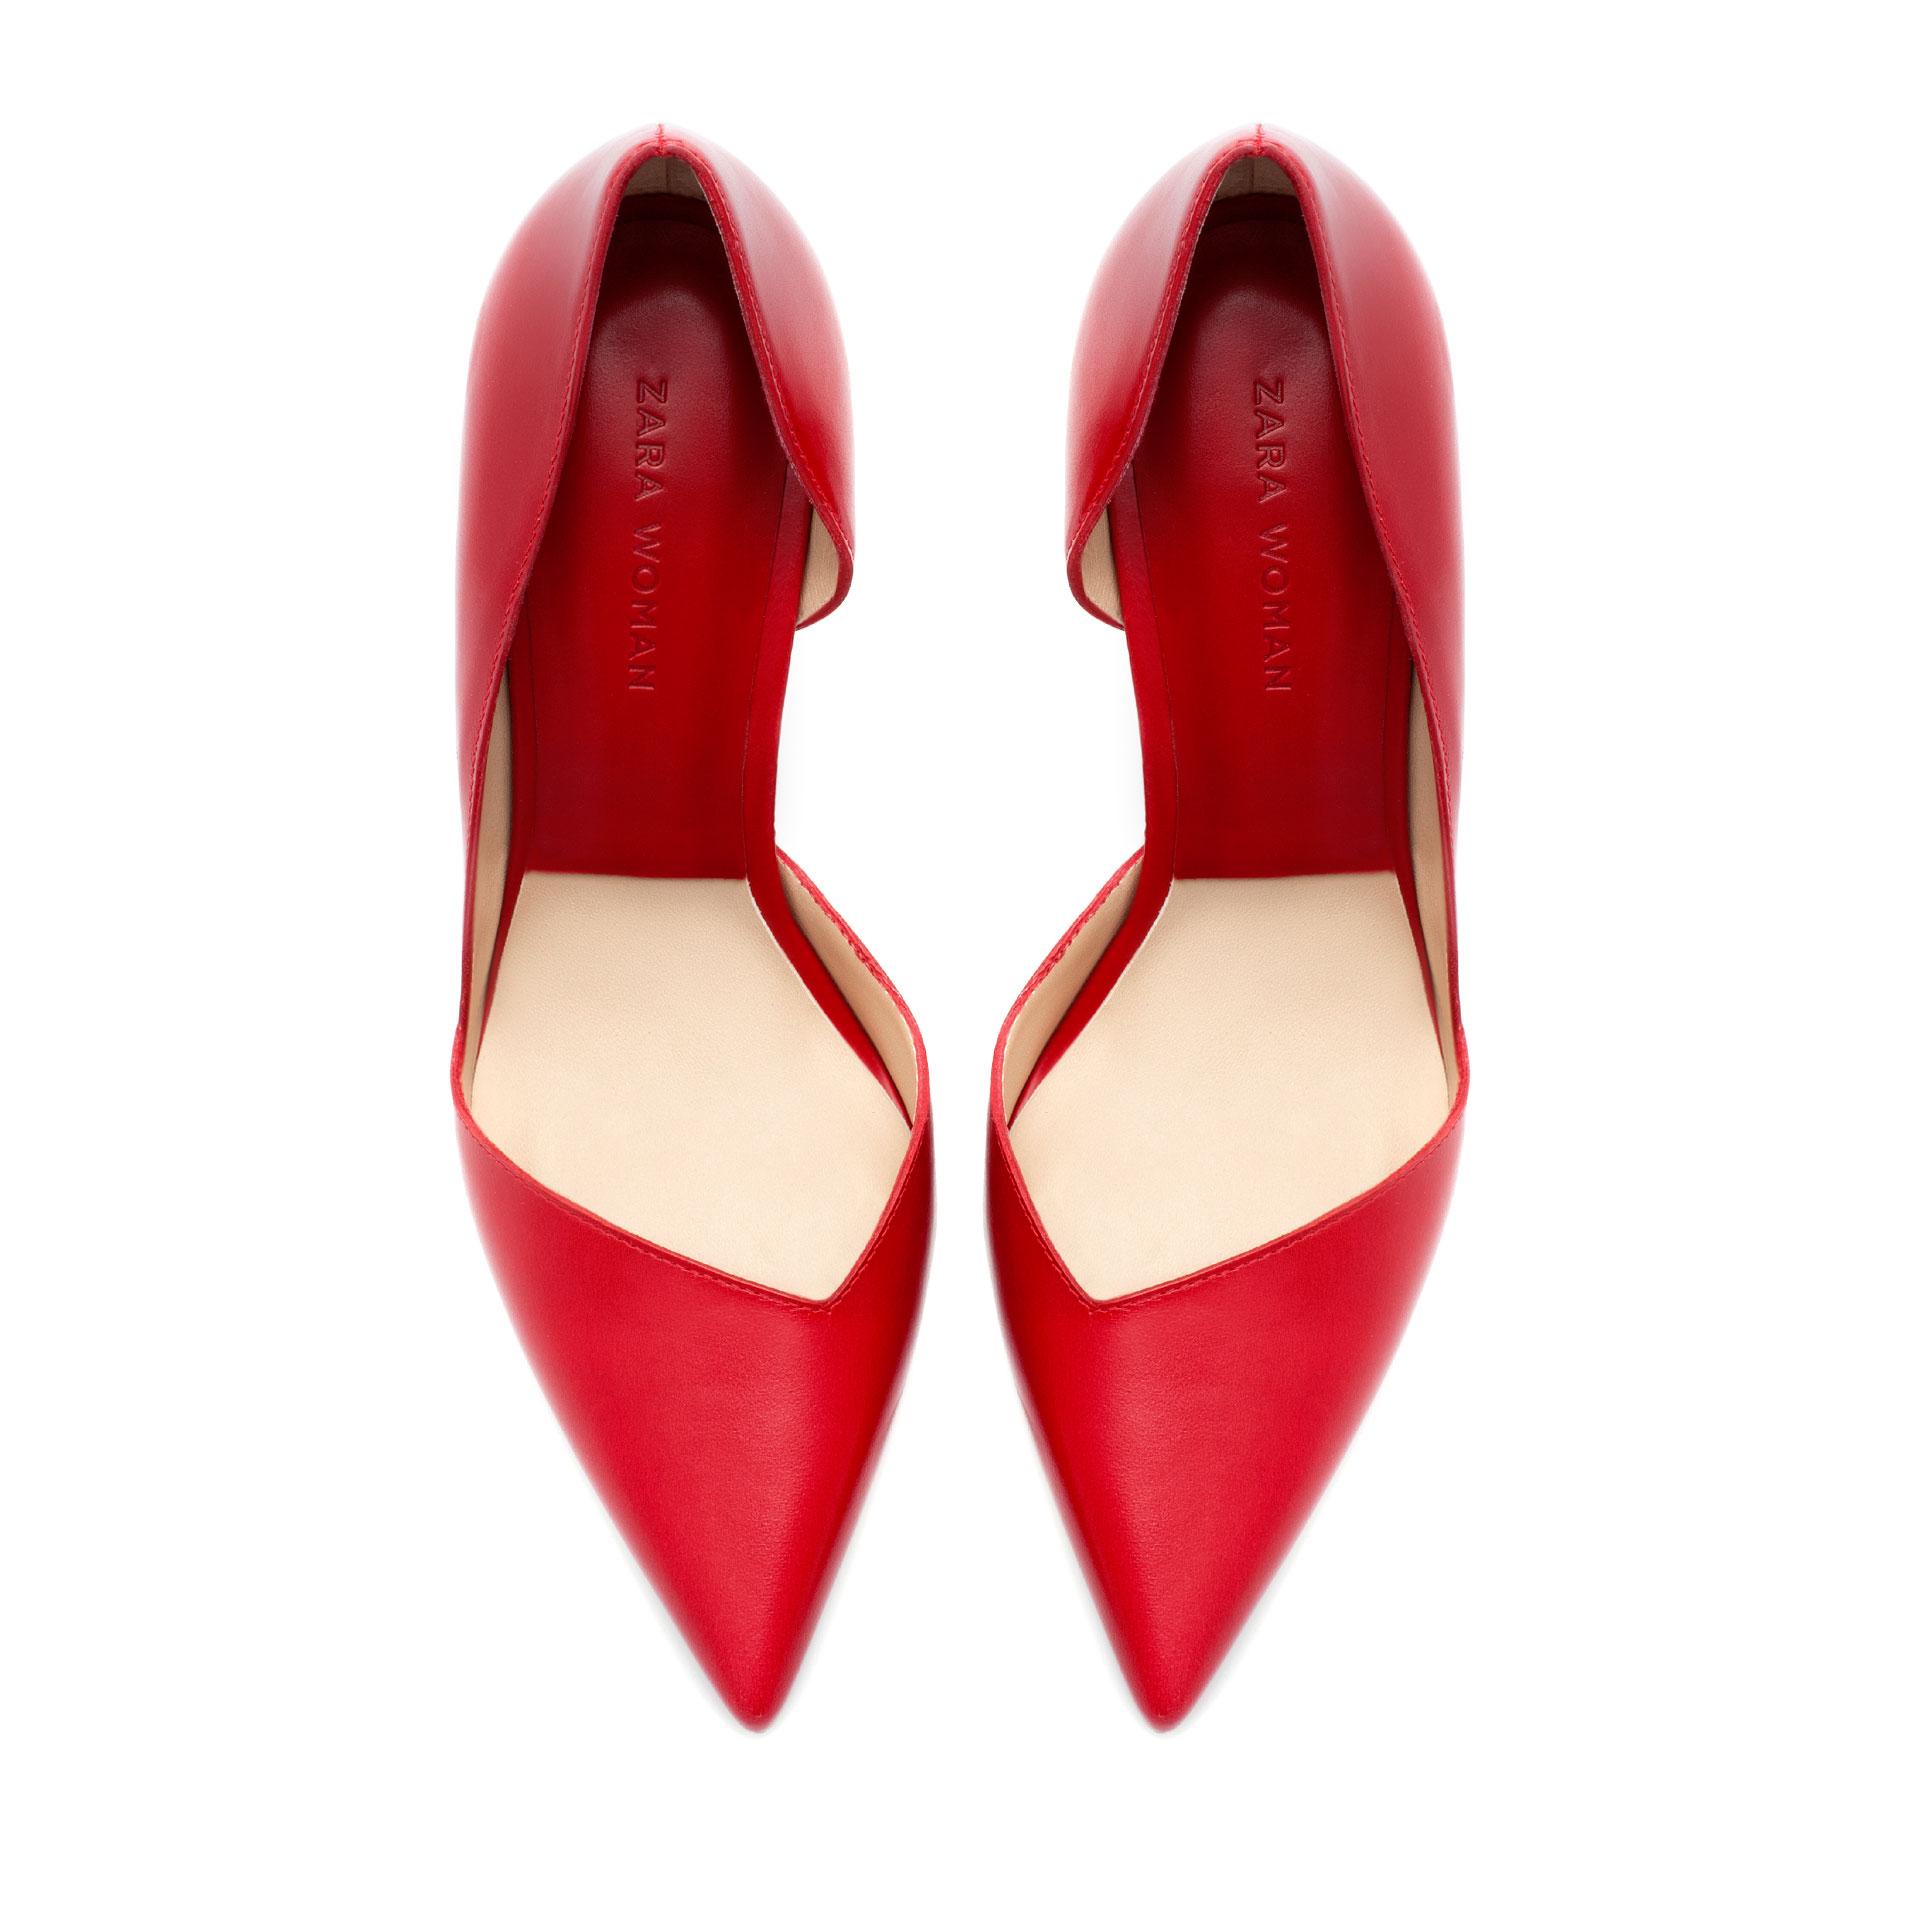 4bdfdf4964f High Heel Shoes  Zara Red High Heel Shoes